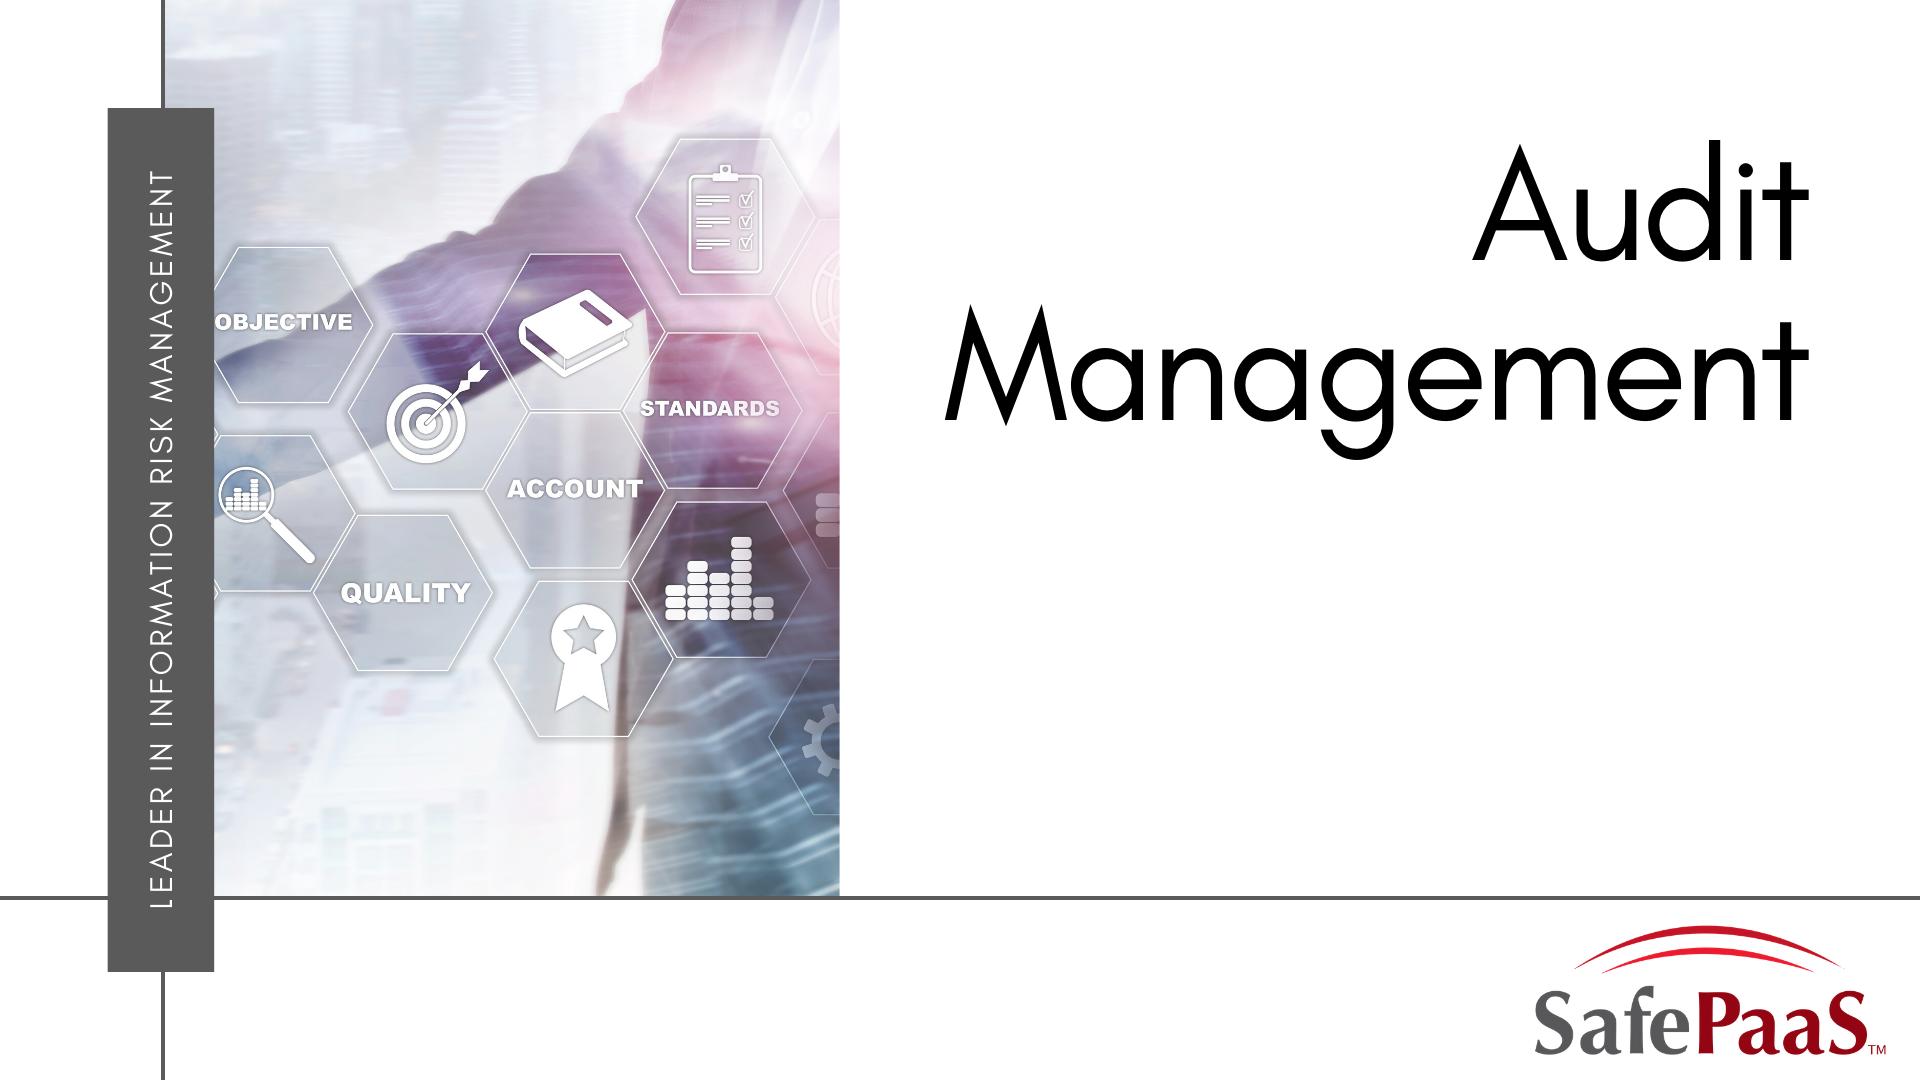 Audit Management Infographic